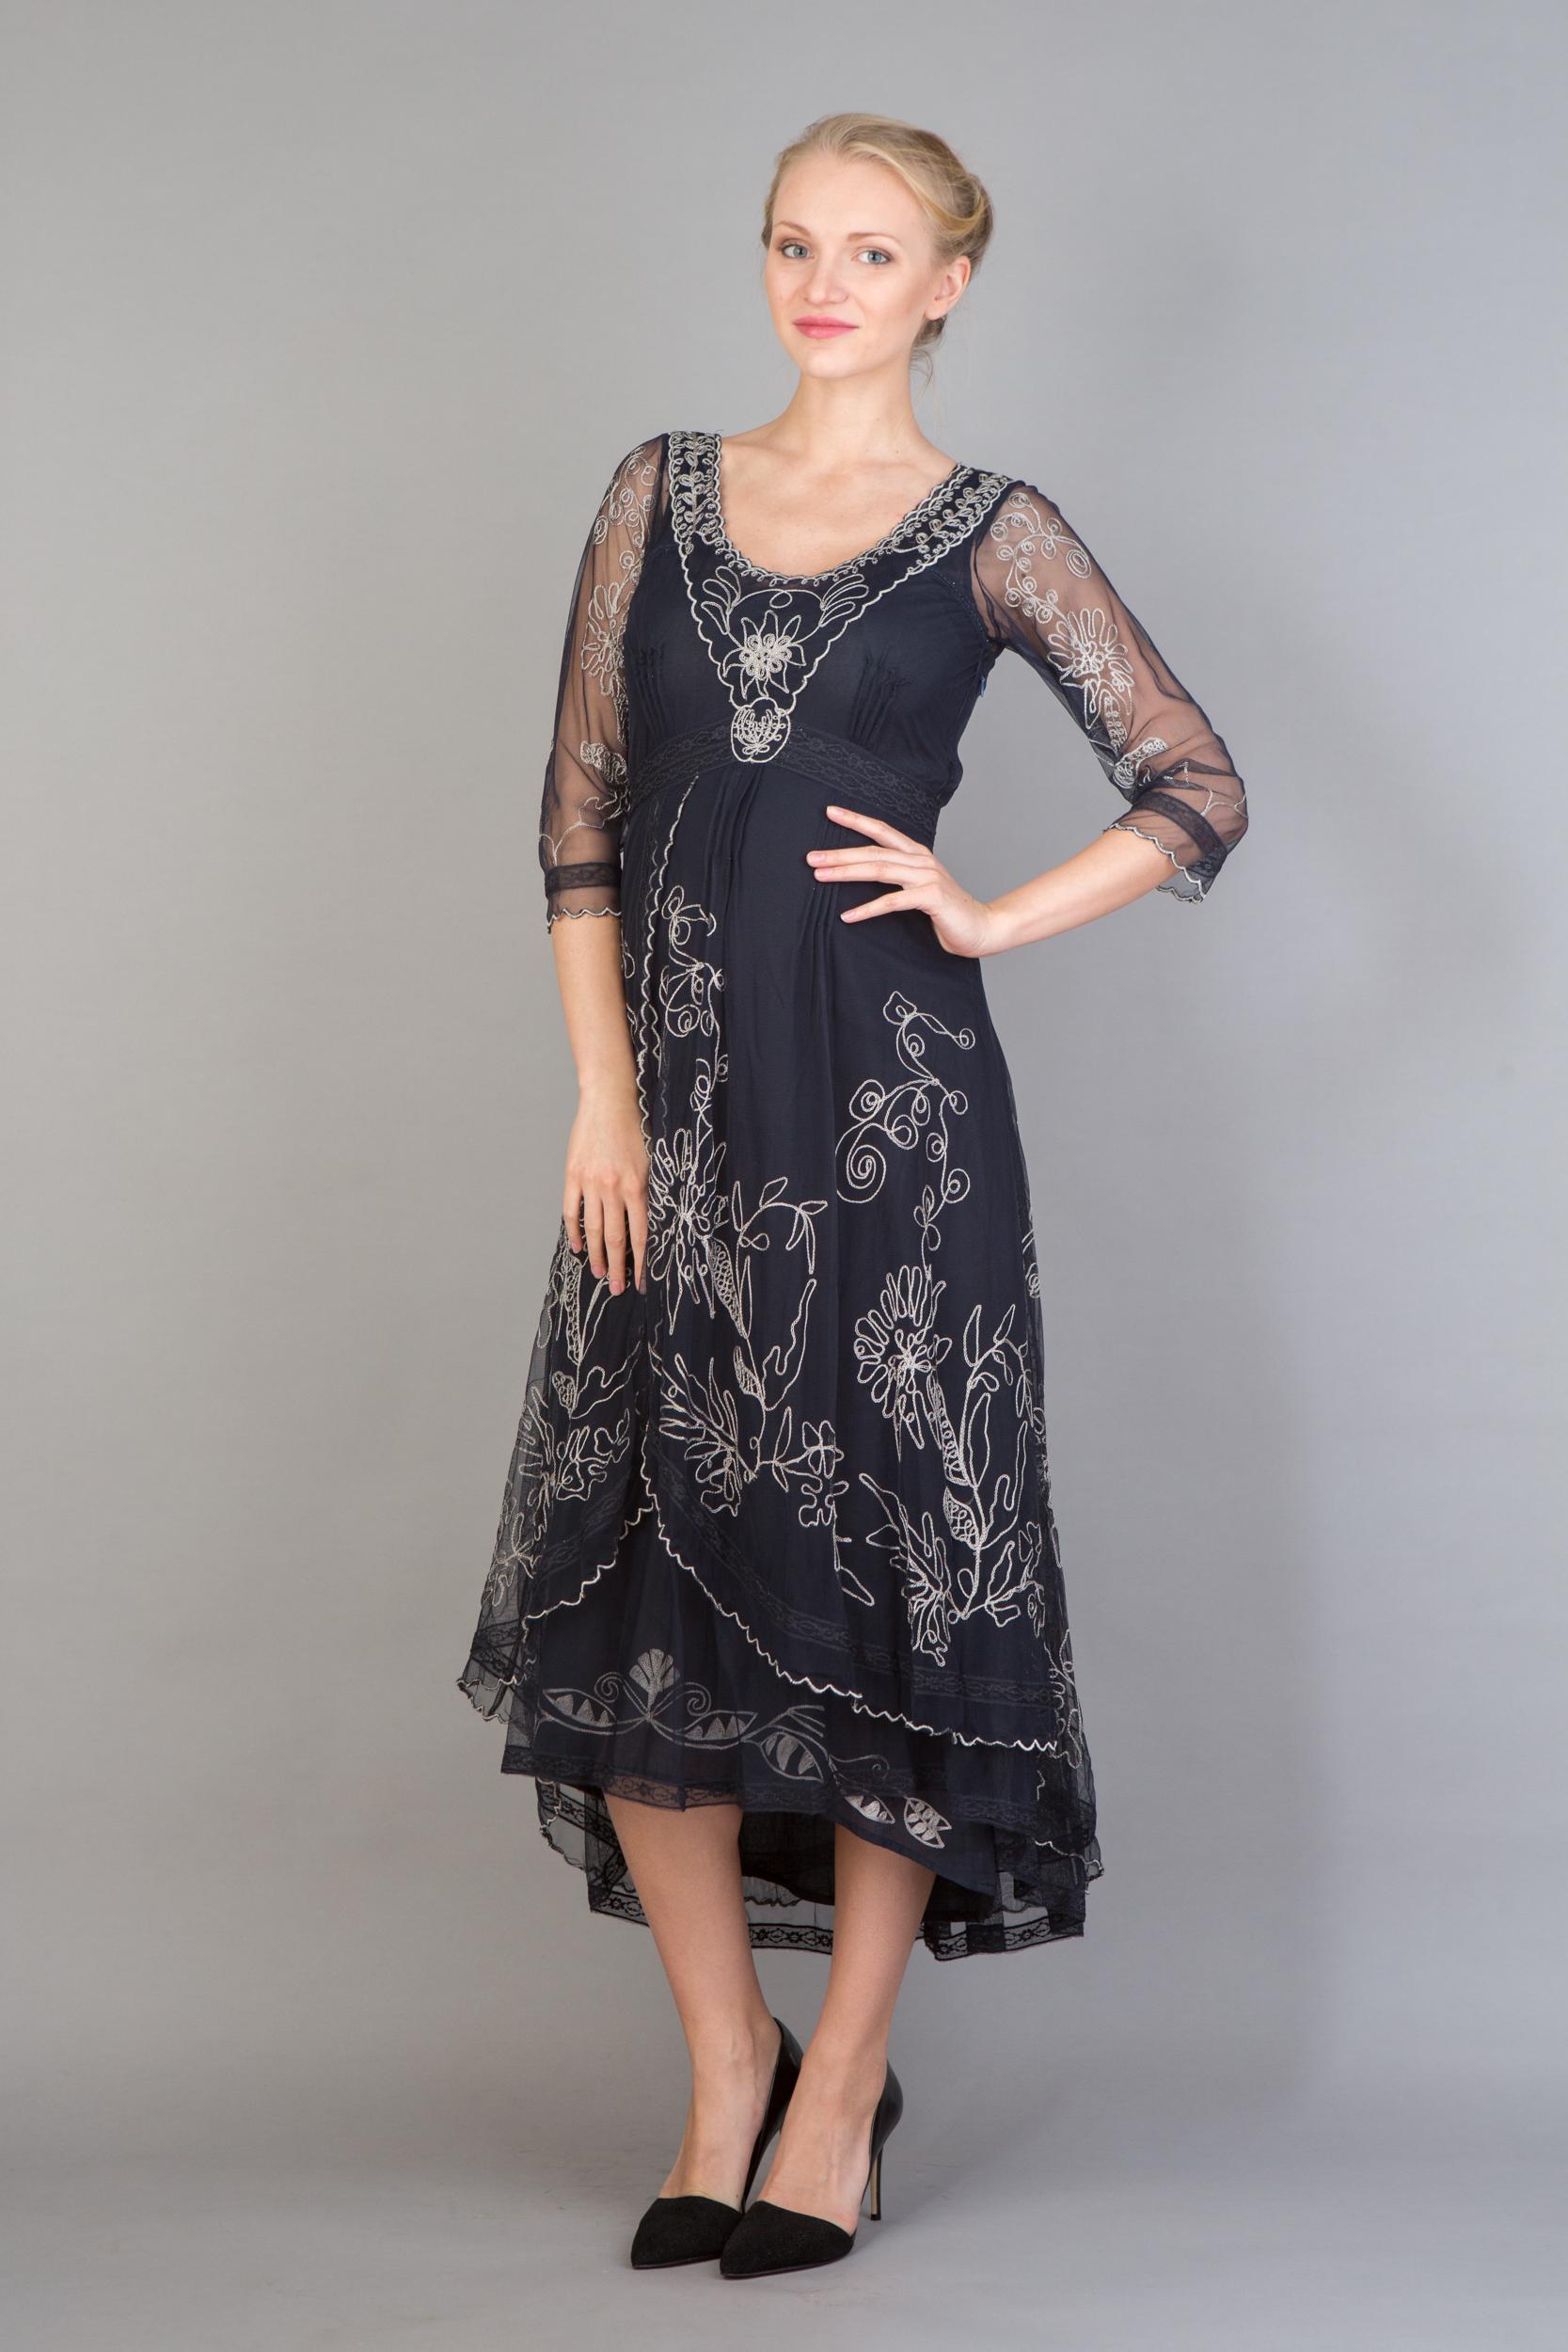 Nataya Vintage Style Romantic Wedding Dresses - Nataya Dresses